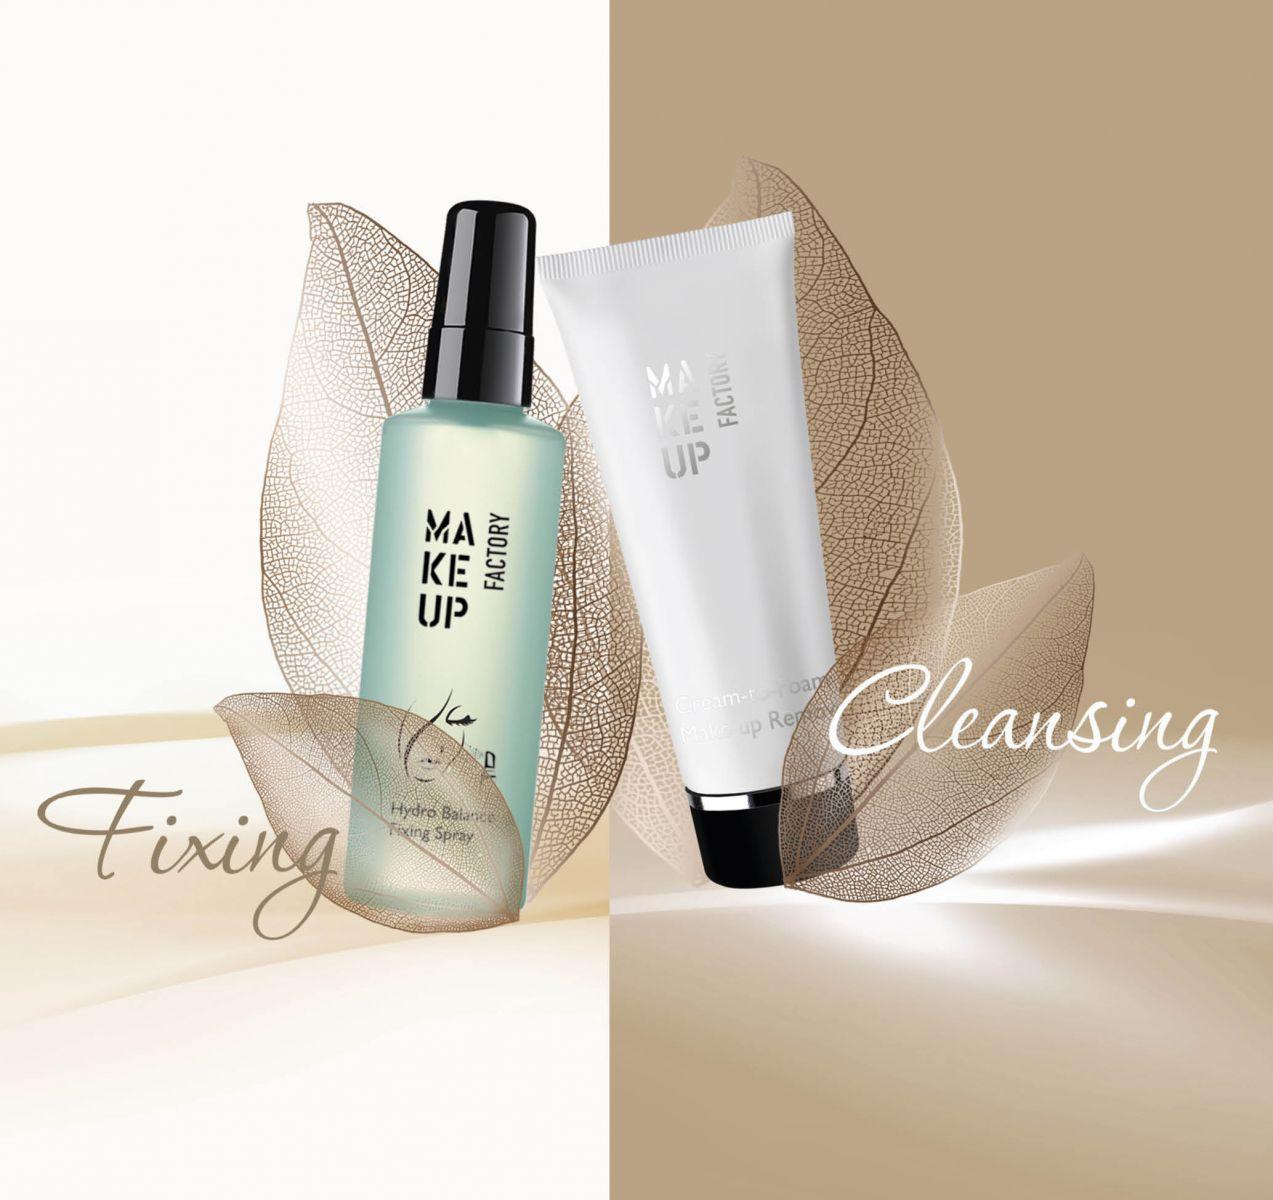 Летние помощники: новый спрей Hydro Balance Fixing Spray и пенка Cream-to-Foam Make up Remover от Make up Factory